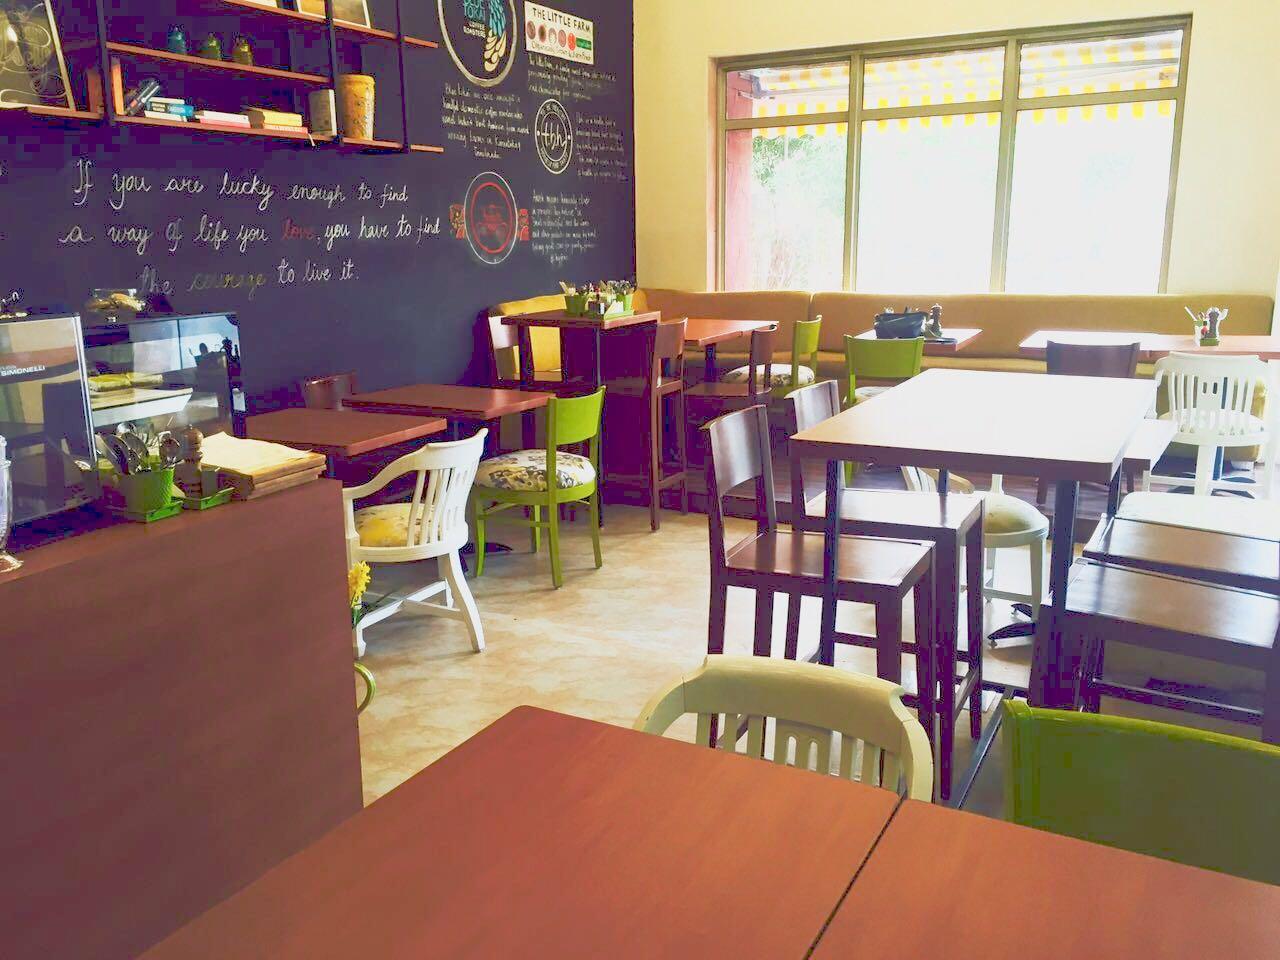 wanderlust-wednesday-natasha-musing-c'est-la-vie-thats-life-cafe